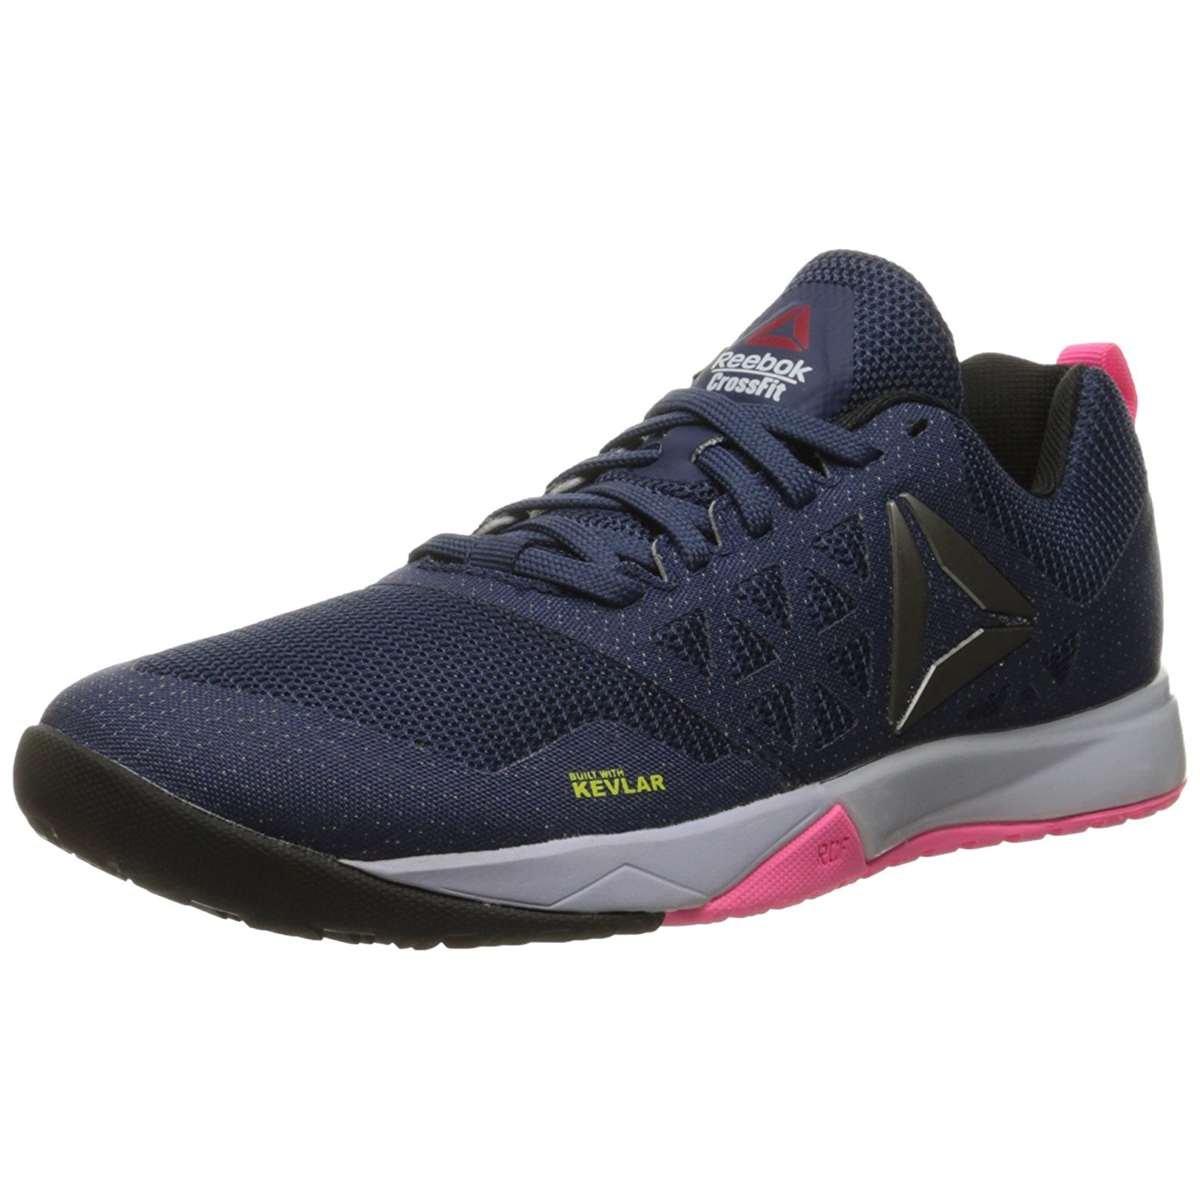 Reebok Women's Crossfit Nano 6-0 Cross-Trainer Shoe, Blue Ink/Lucid Lilac/Poison Pink/Black/Pewter, 8 M US